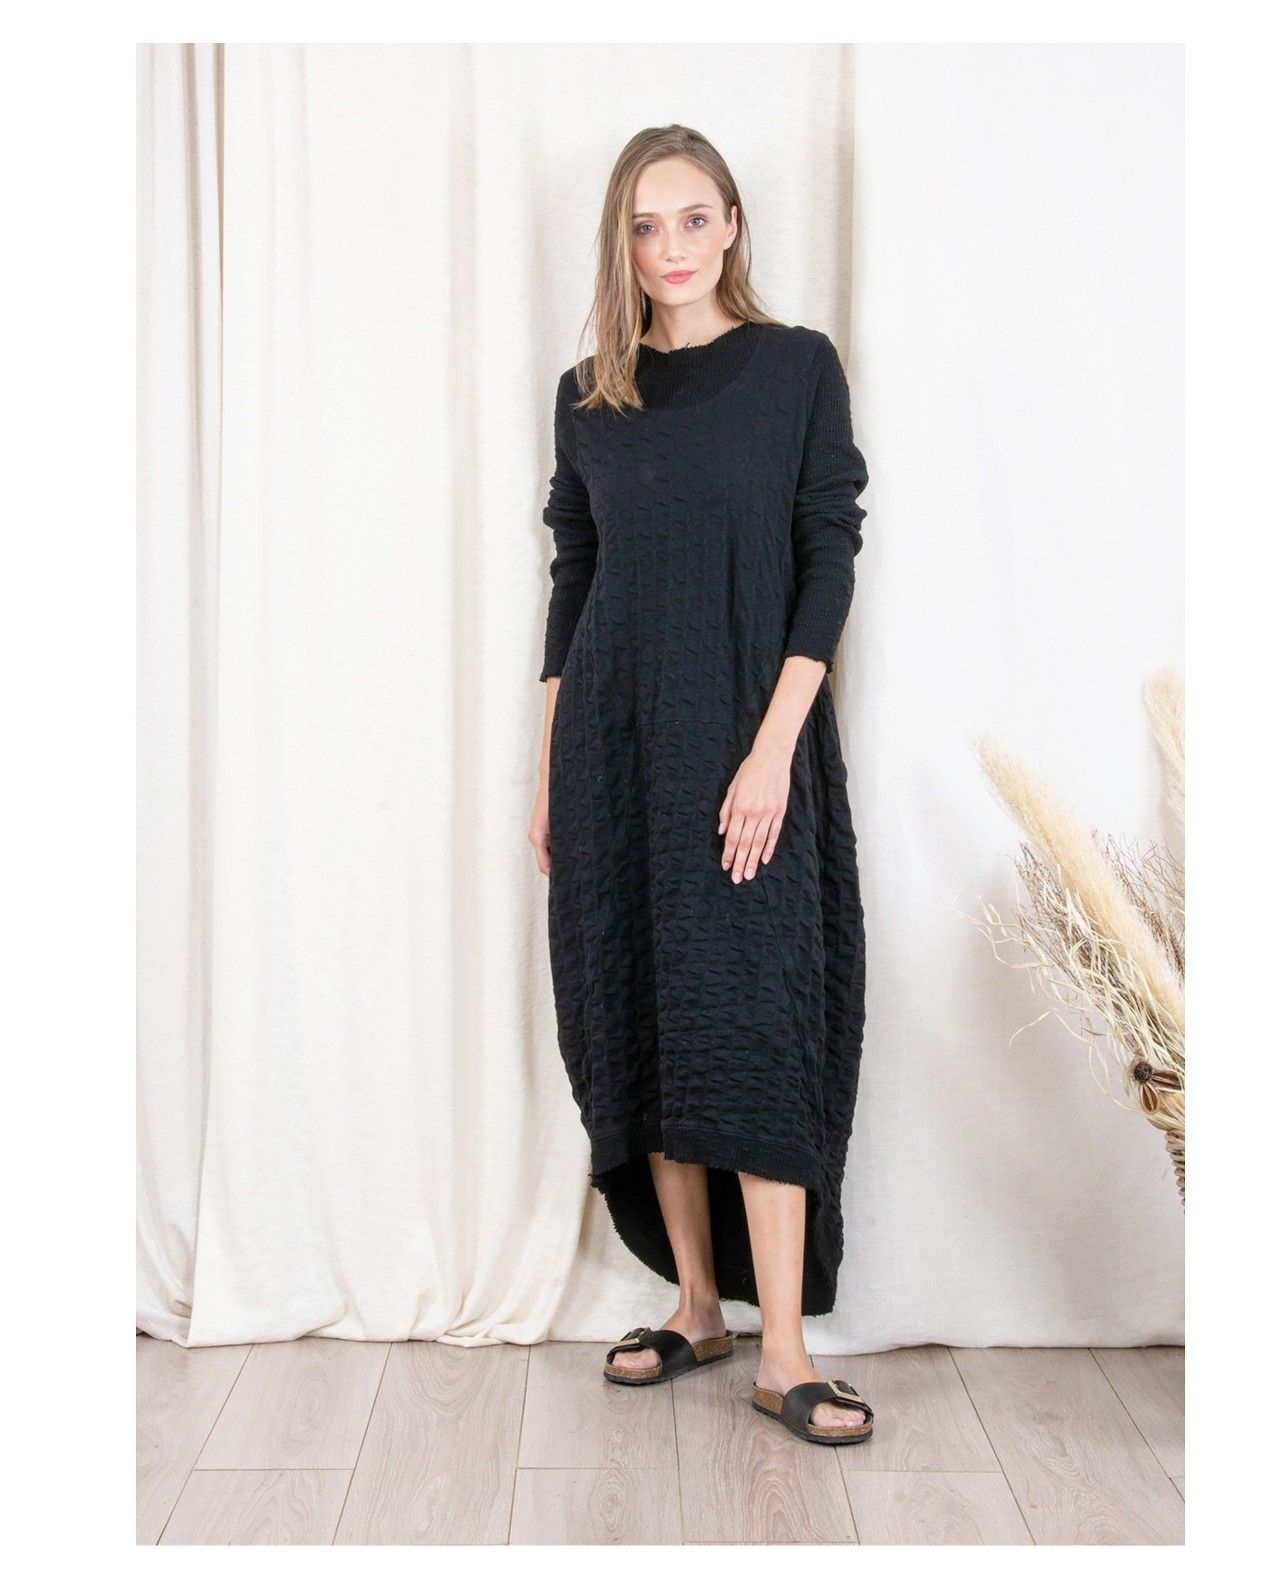 #woman #dress #fashionblogger #fashionista #styleoftheday #style #ethicalstore #clothingbrand #newdesign #greekdesigners #clothes